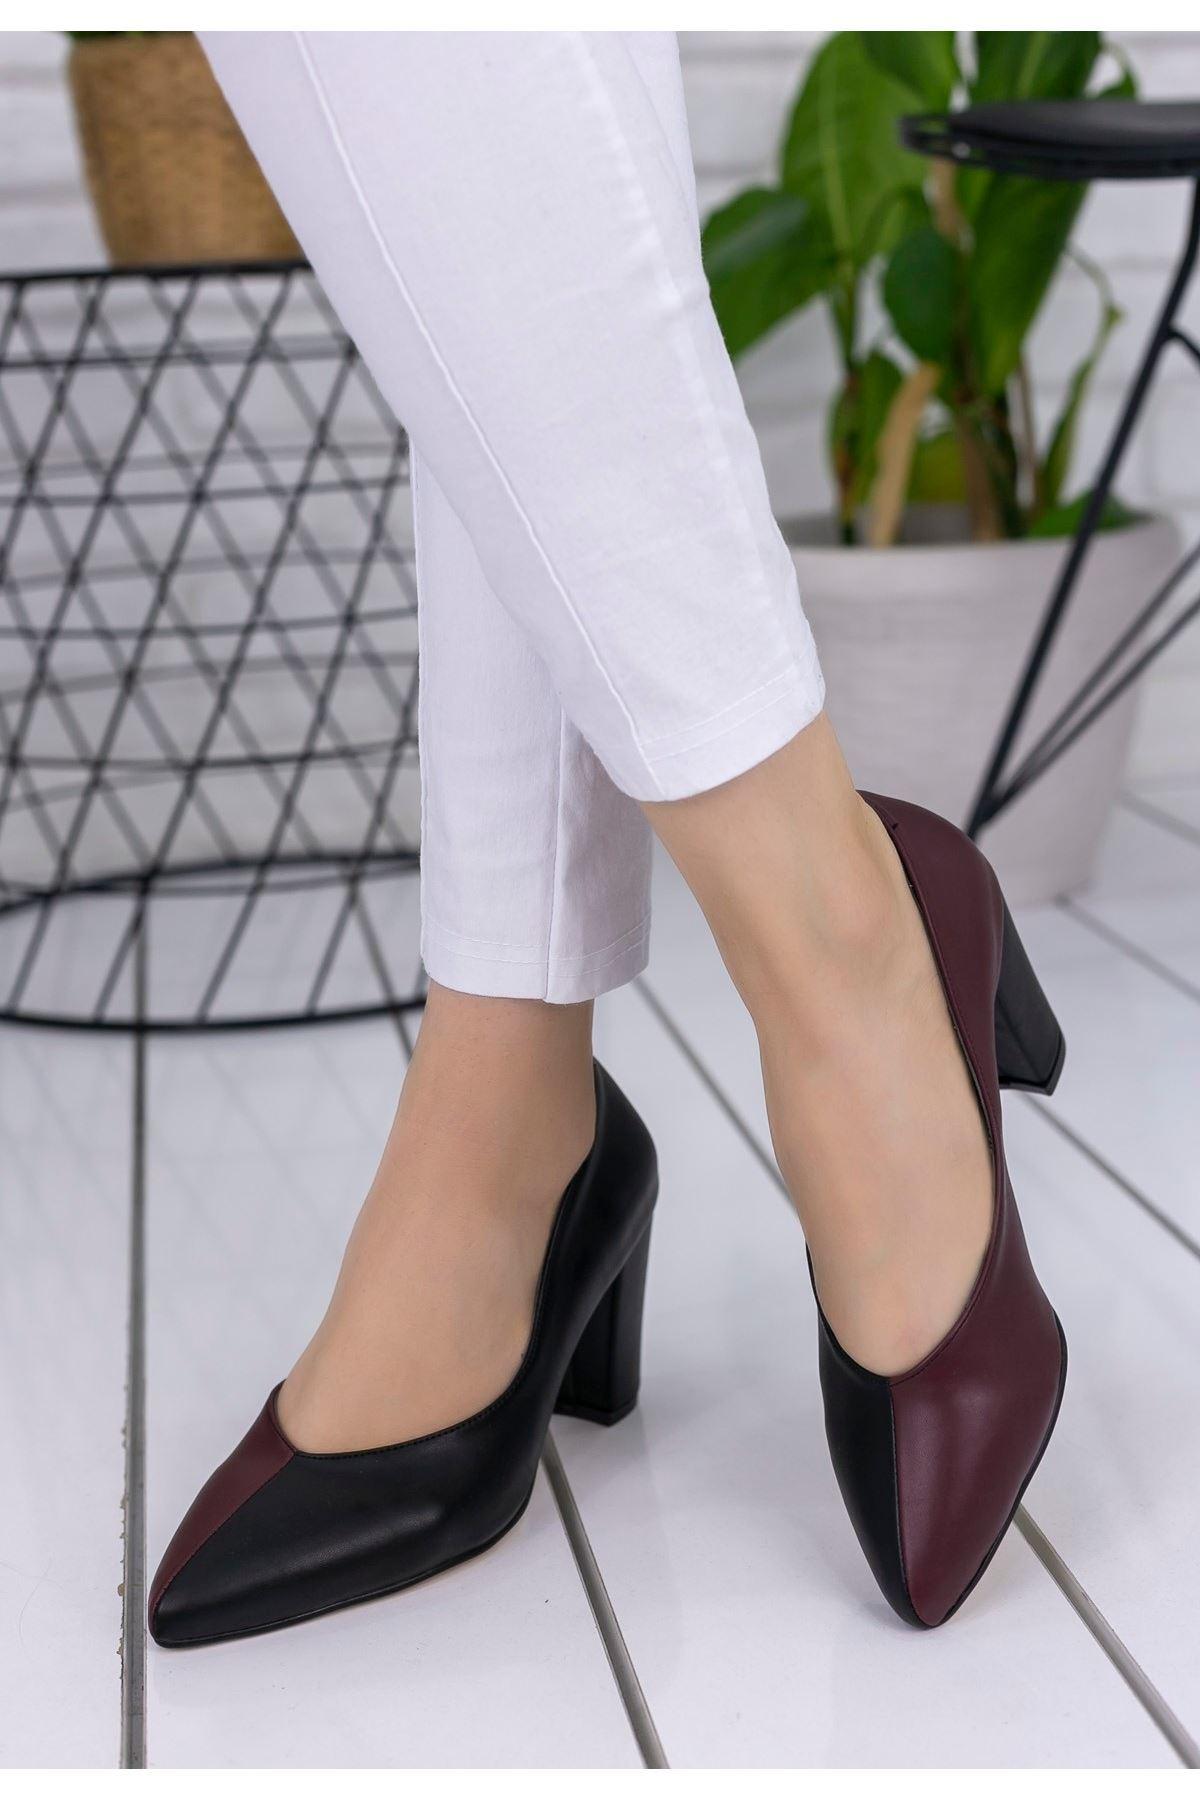 Wilona Siyah Bordo Cilt Topuklu Ayakkabı